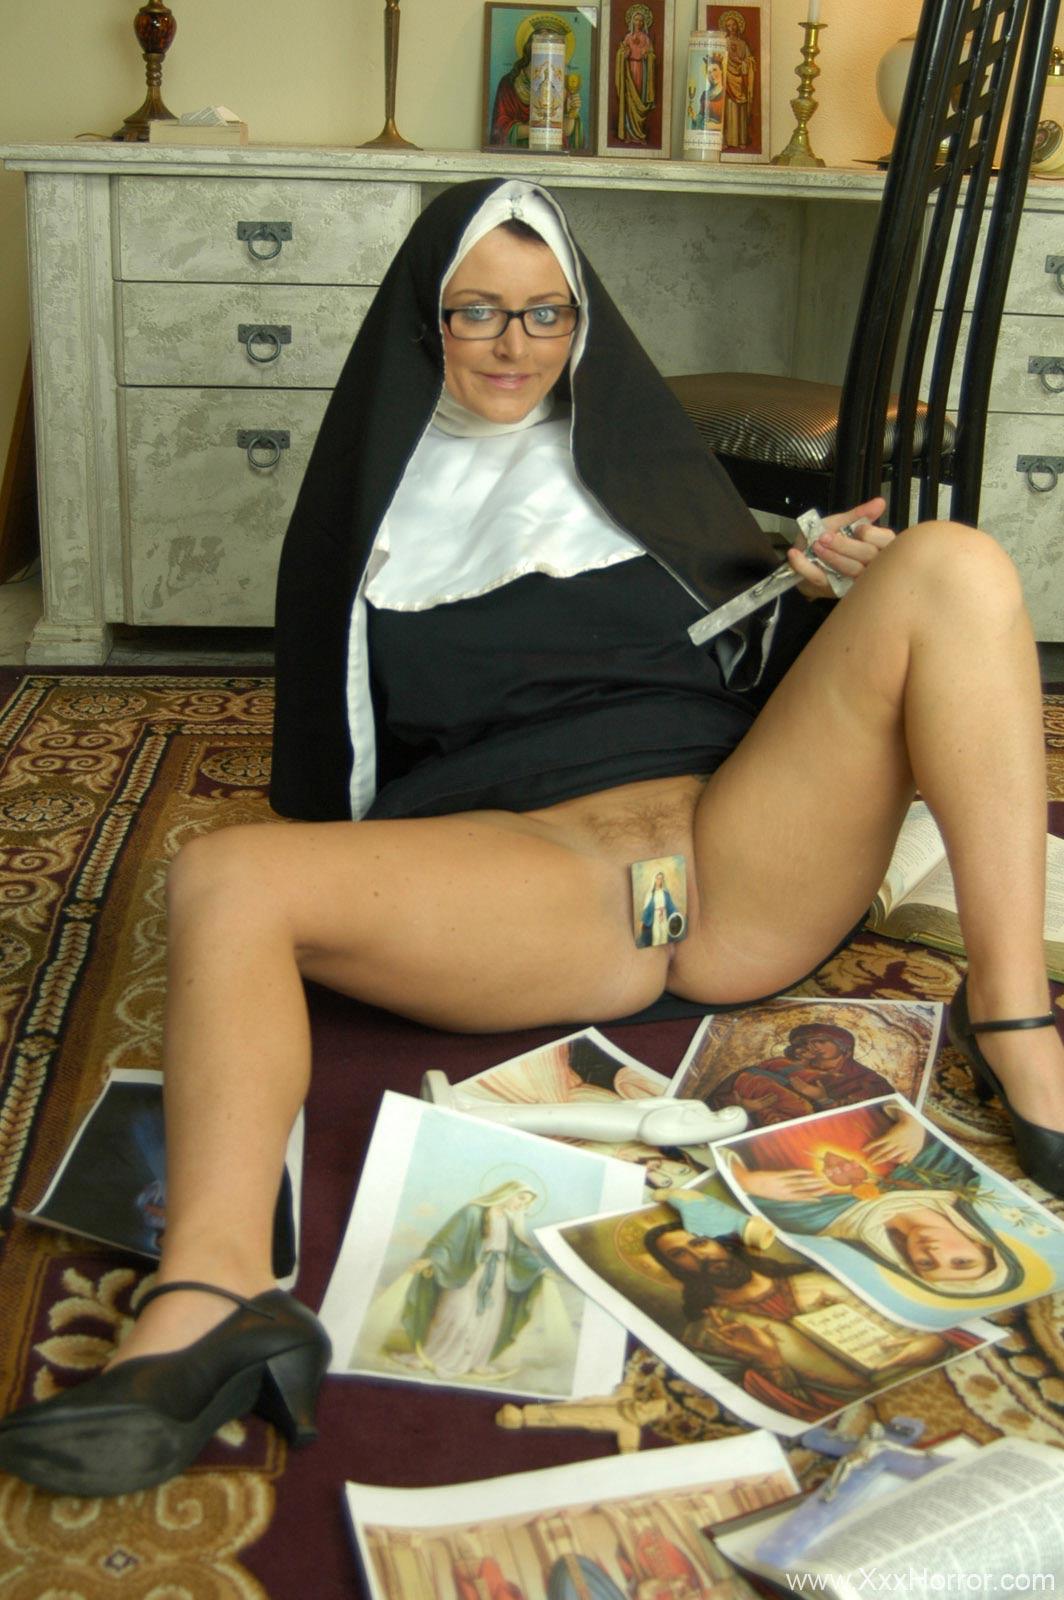 Big Boob Hot Ass Nun Sophie Dee in Blasphemy in the priest